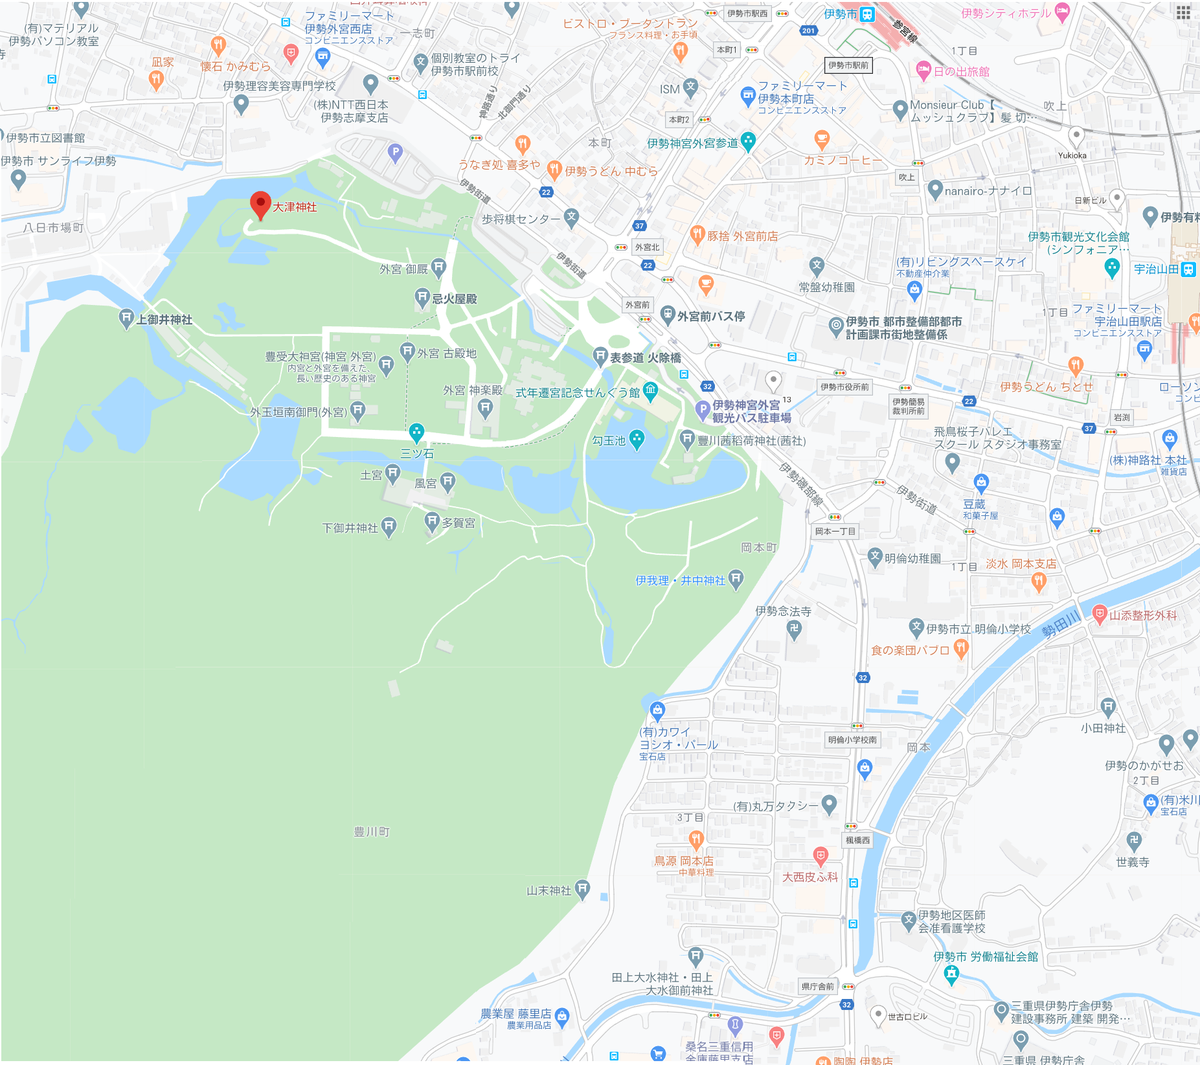 f:id:itoshiya8ise:20200706135814p:plain